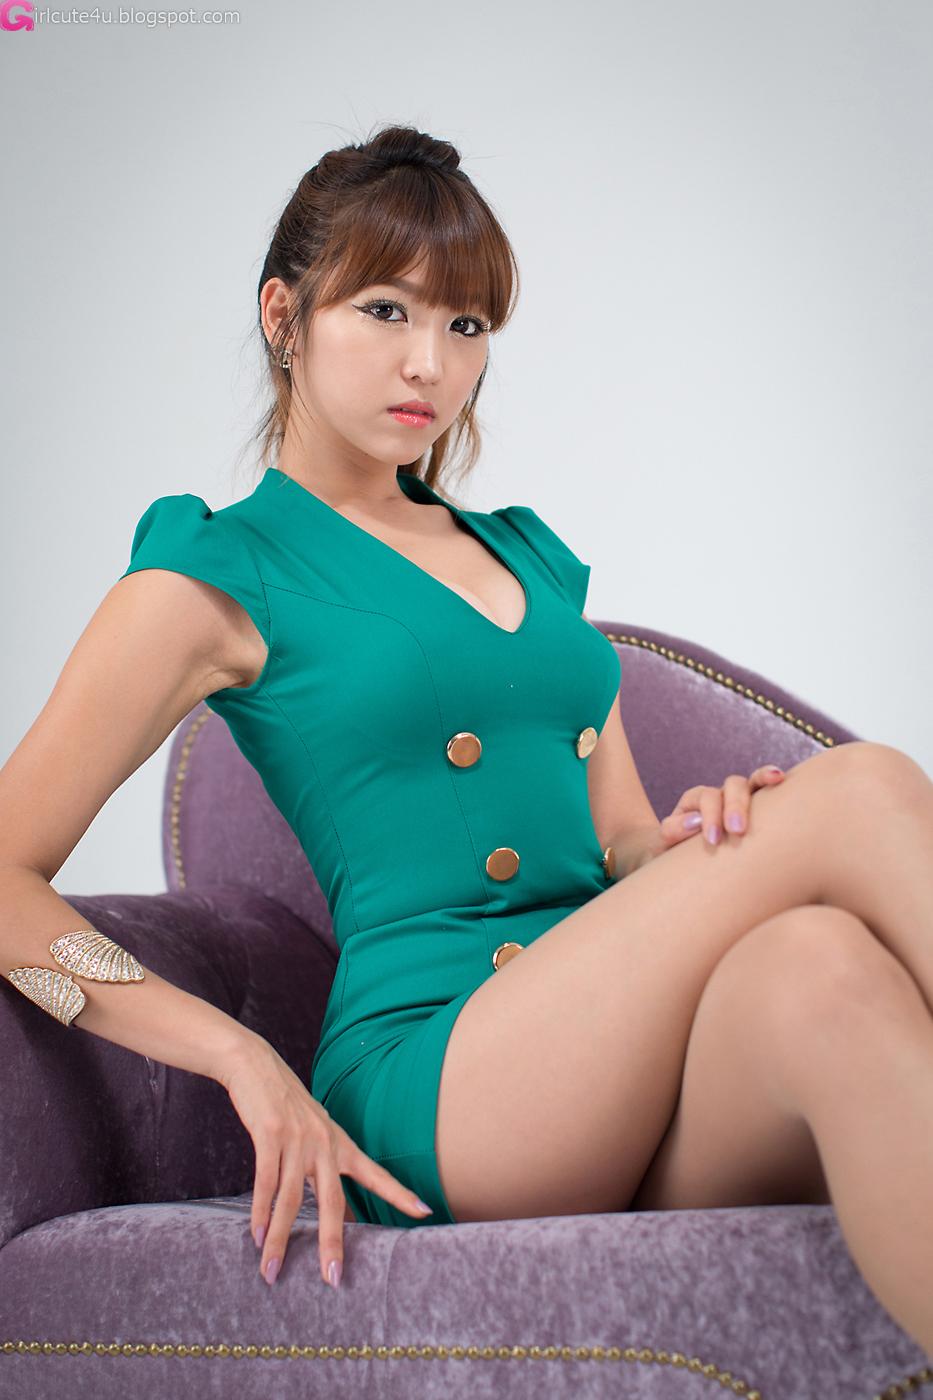 Sexy Lee Eun Hye in green mini dress, almost perfect! Enjoy ^^~: http://girlcute4us.blogspot.com/2012/08/sexy-office-lady-lee-eun-hye.html